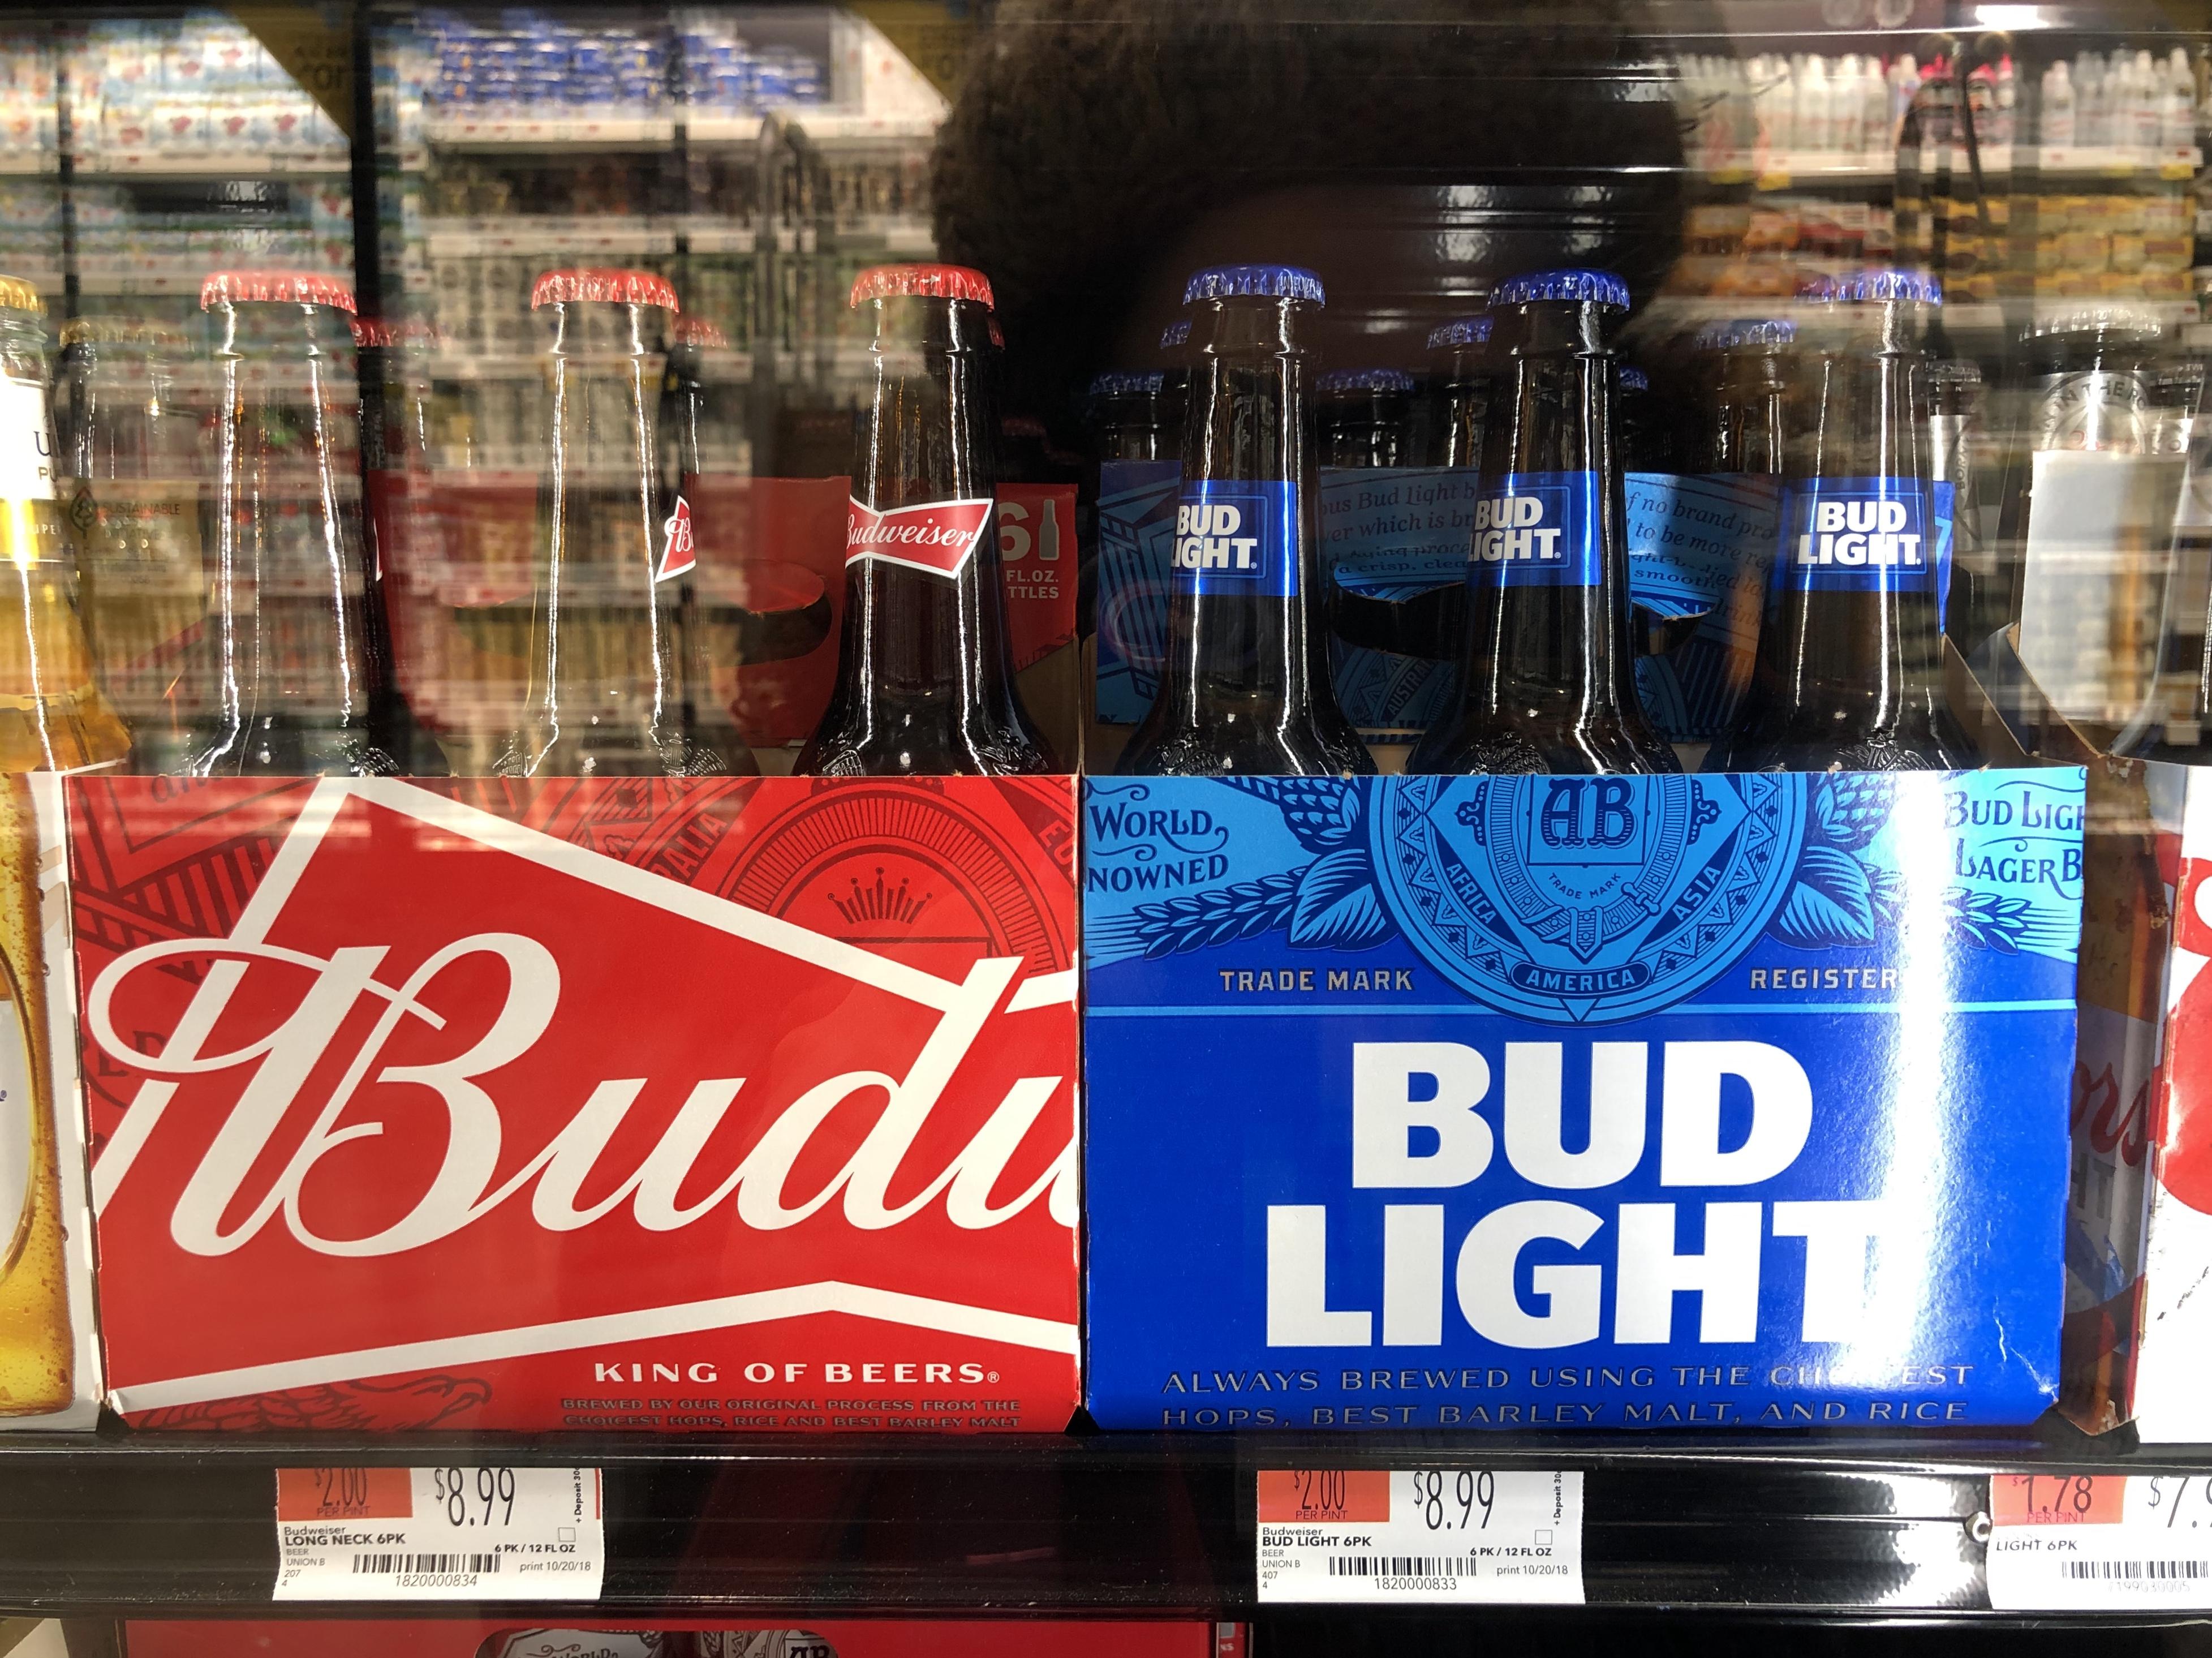 Whole Foods Bud Light bottles.